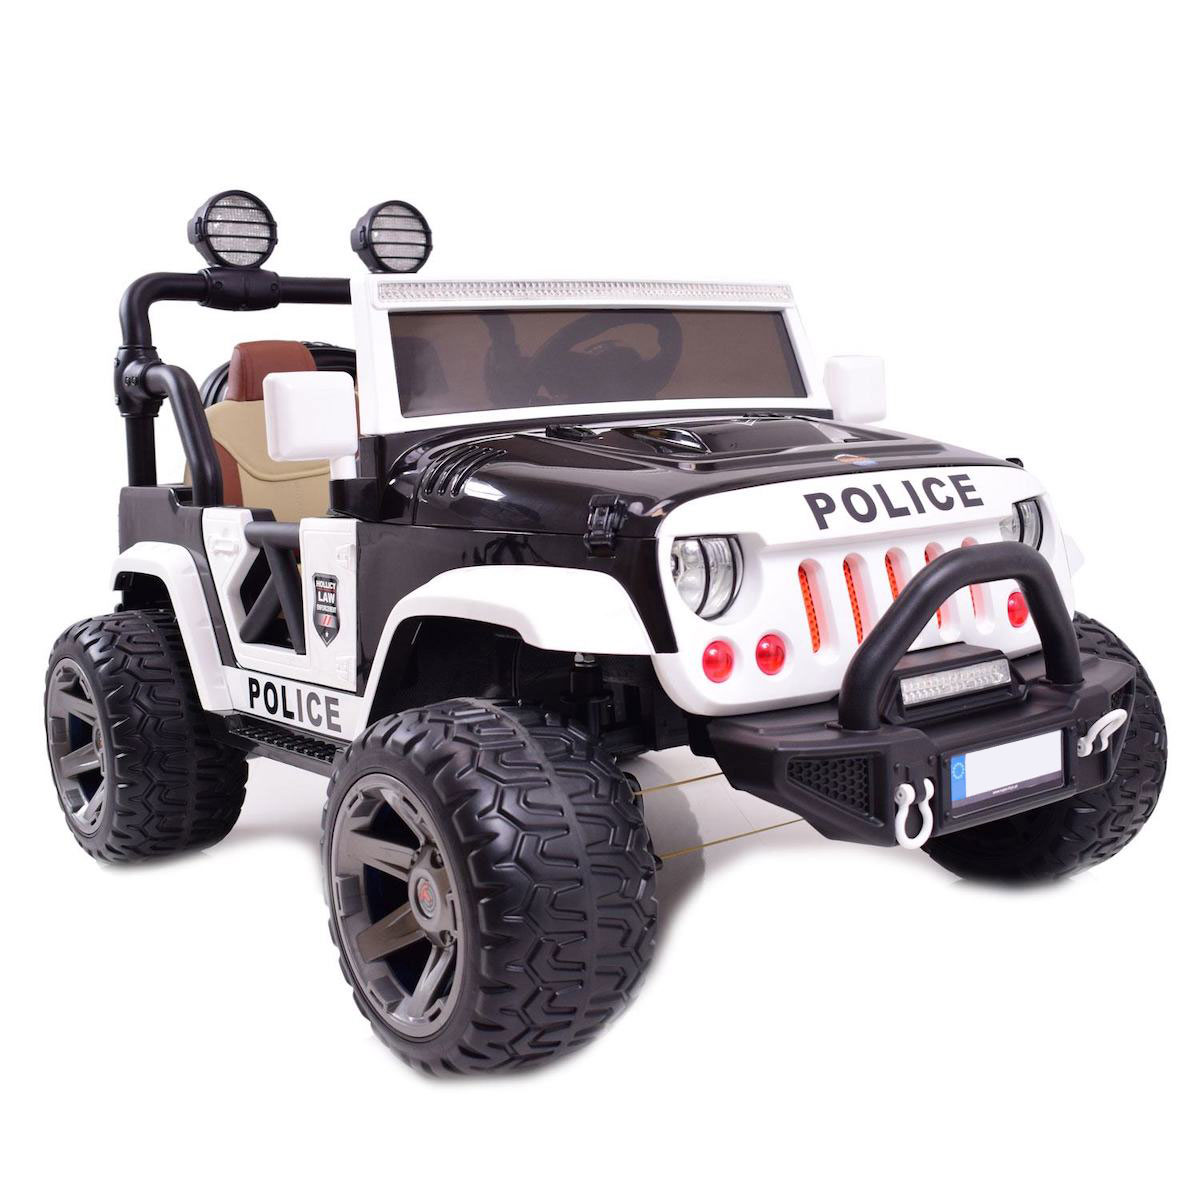 6994ba3dcdf Politsei Jeep 4x4, MP4 LCD! | Jussike | laste elektriautod ...